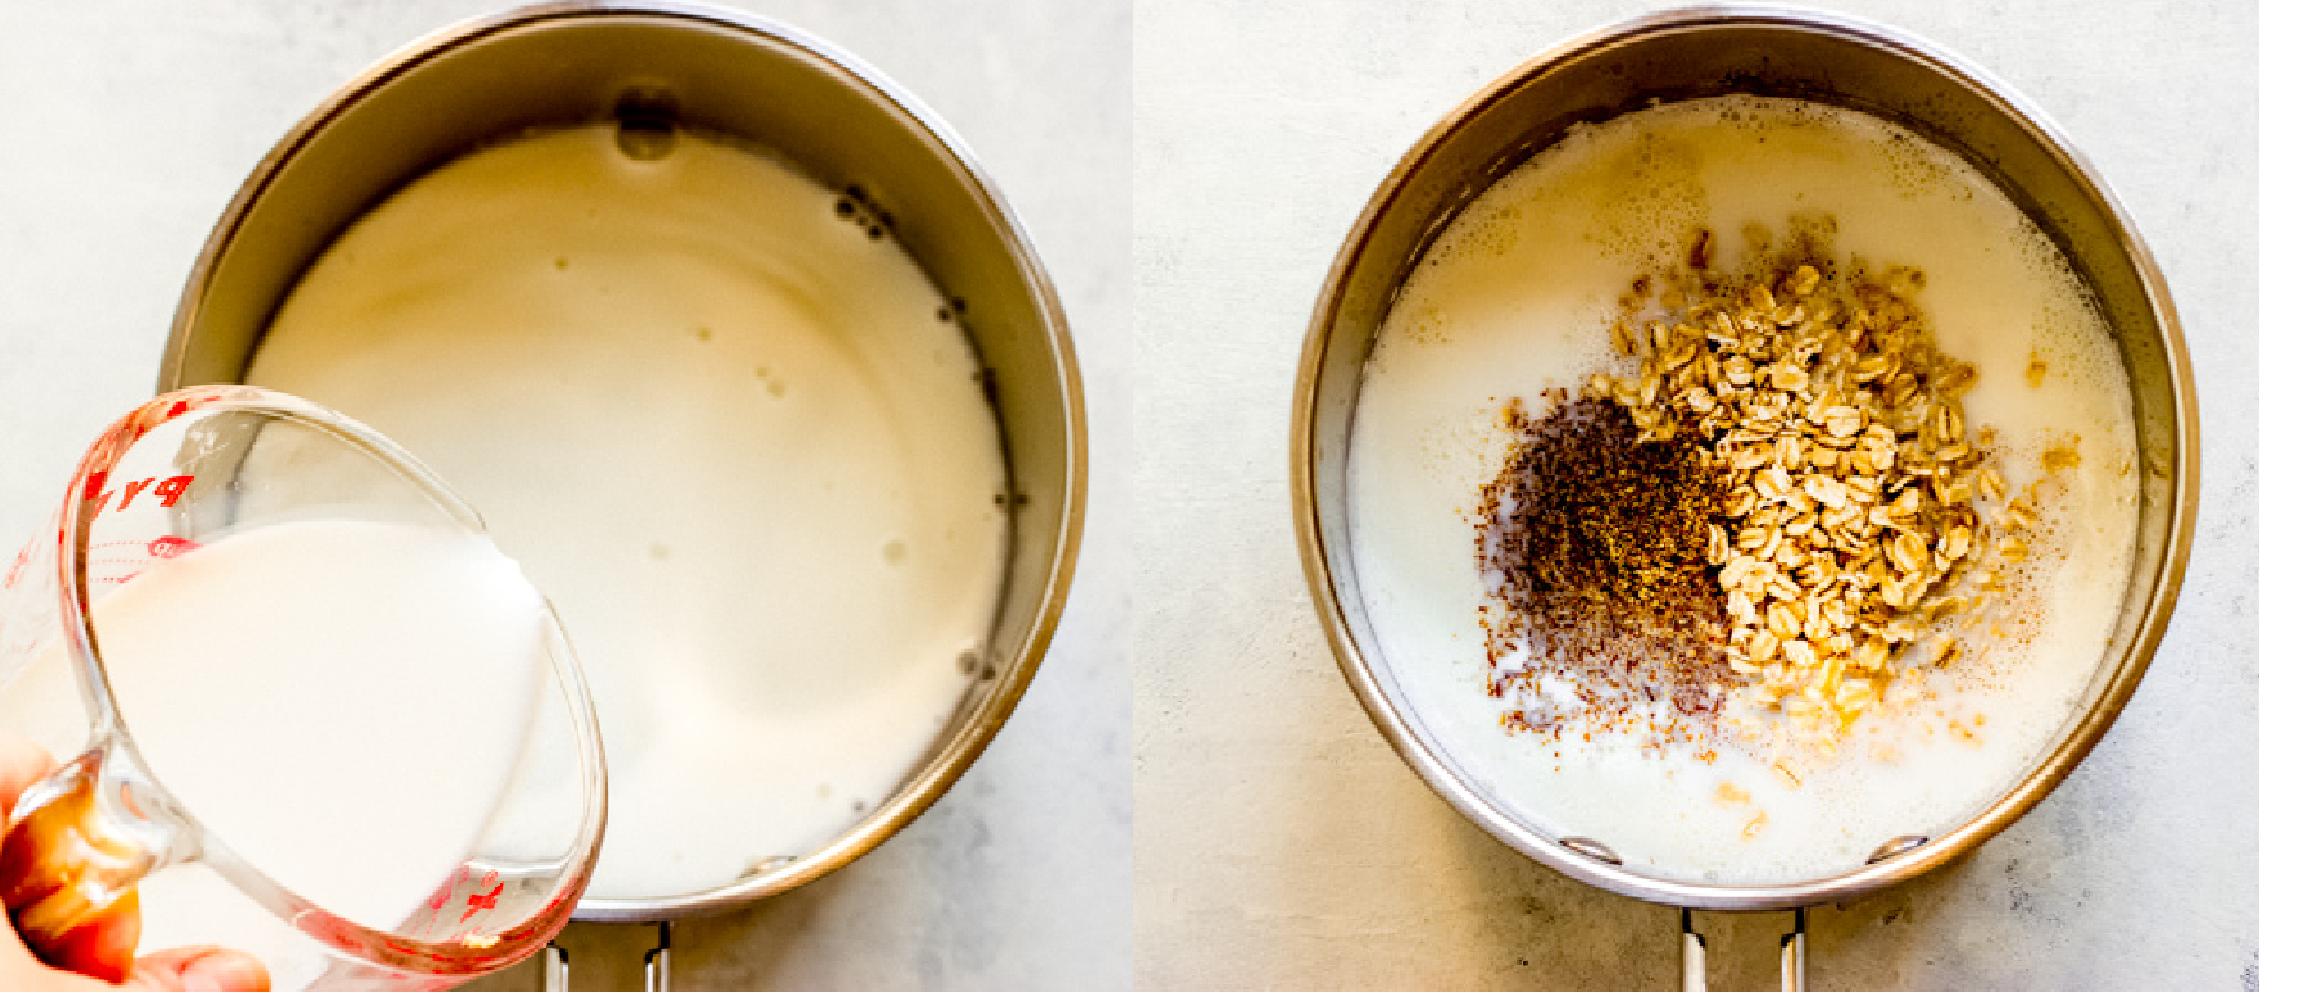 milk with oatmeal in a saucepan